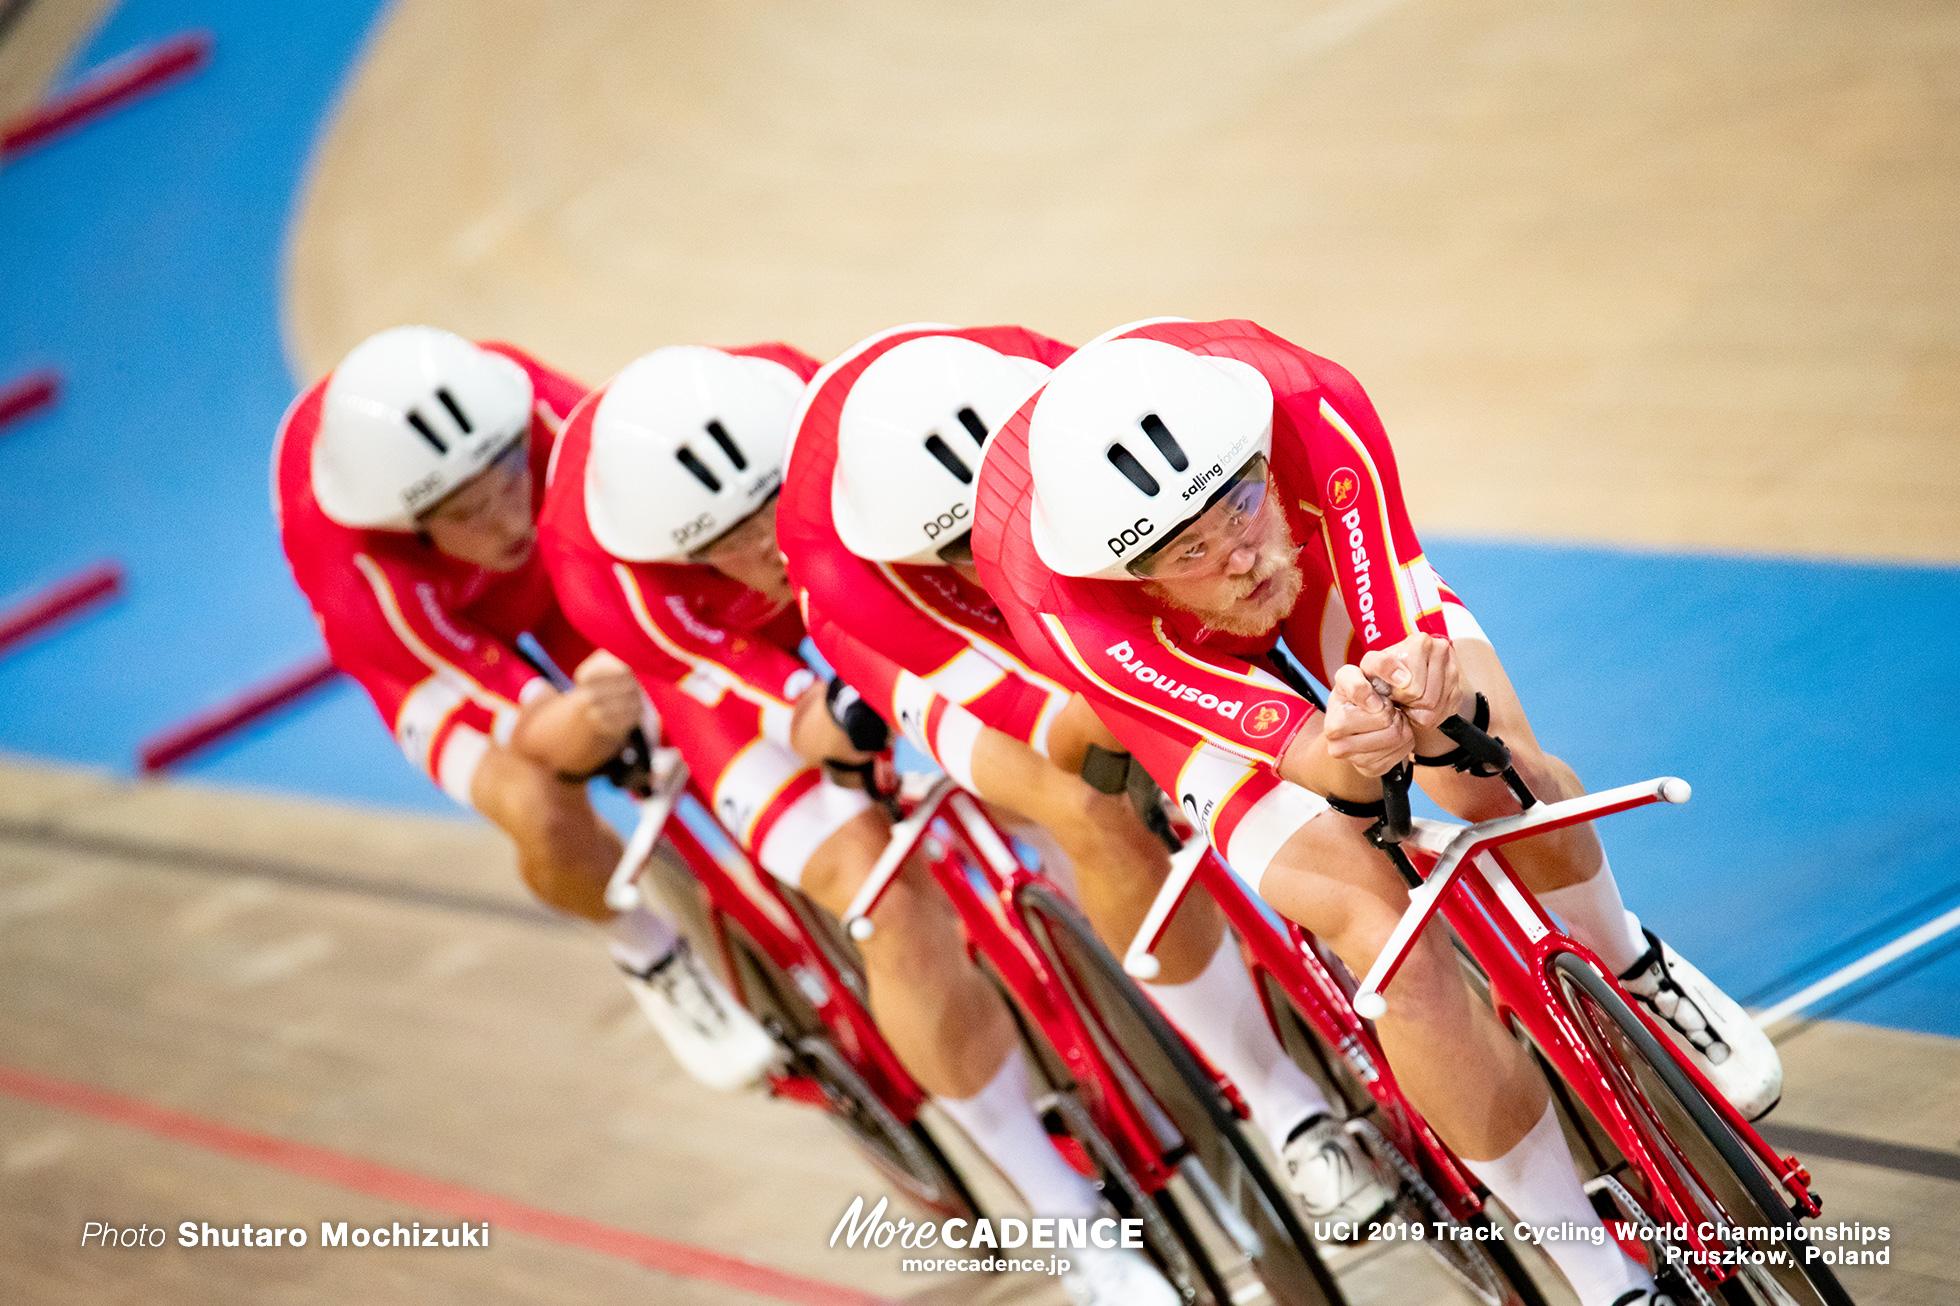 Men's Team Pursuit Final / 2019 Track Cycling World Championships Pruszków, Poland, Lasse Norman Hansen / Julius Johansen / Rasmus Pedersen / Casper von Folsach ラッセ・ノーマン・ハンセン / ジュリアス・ヨハンセン / ラスムス・ペダーセン / キャスパー・フォルザック